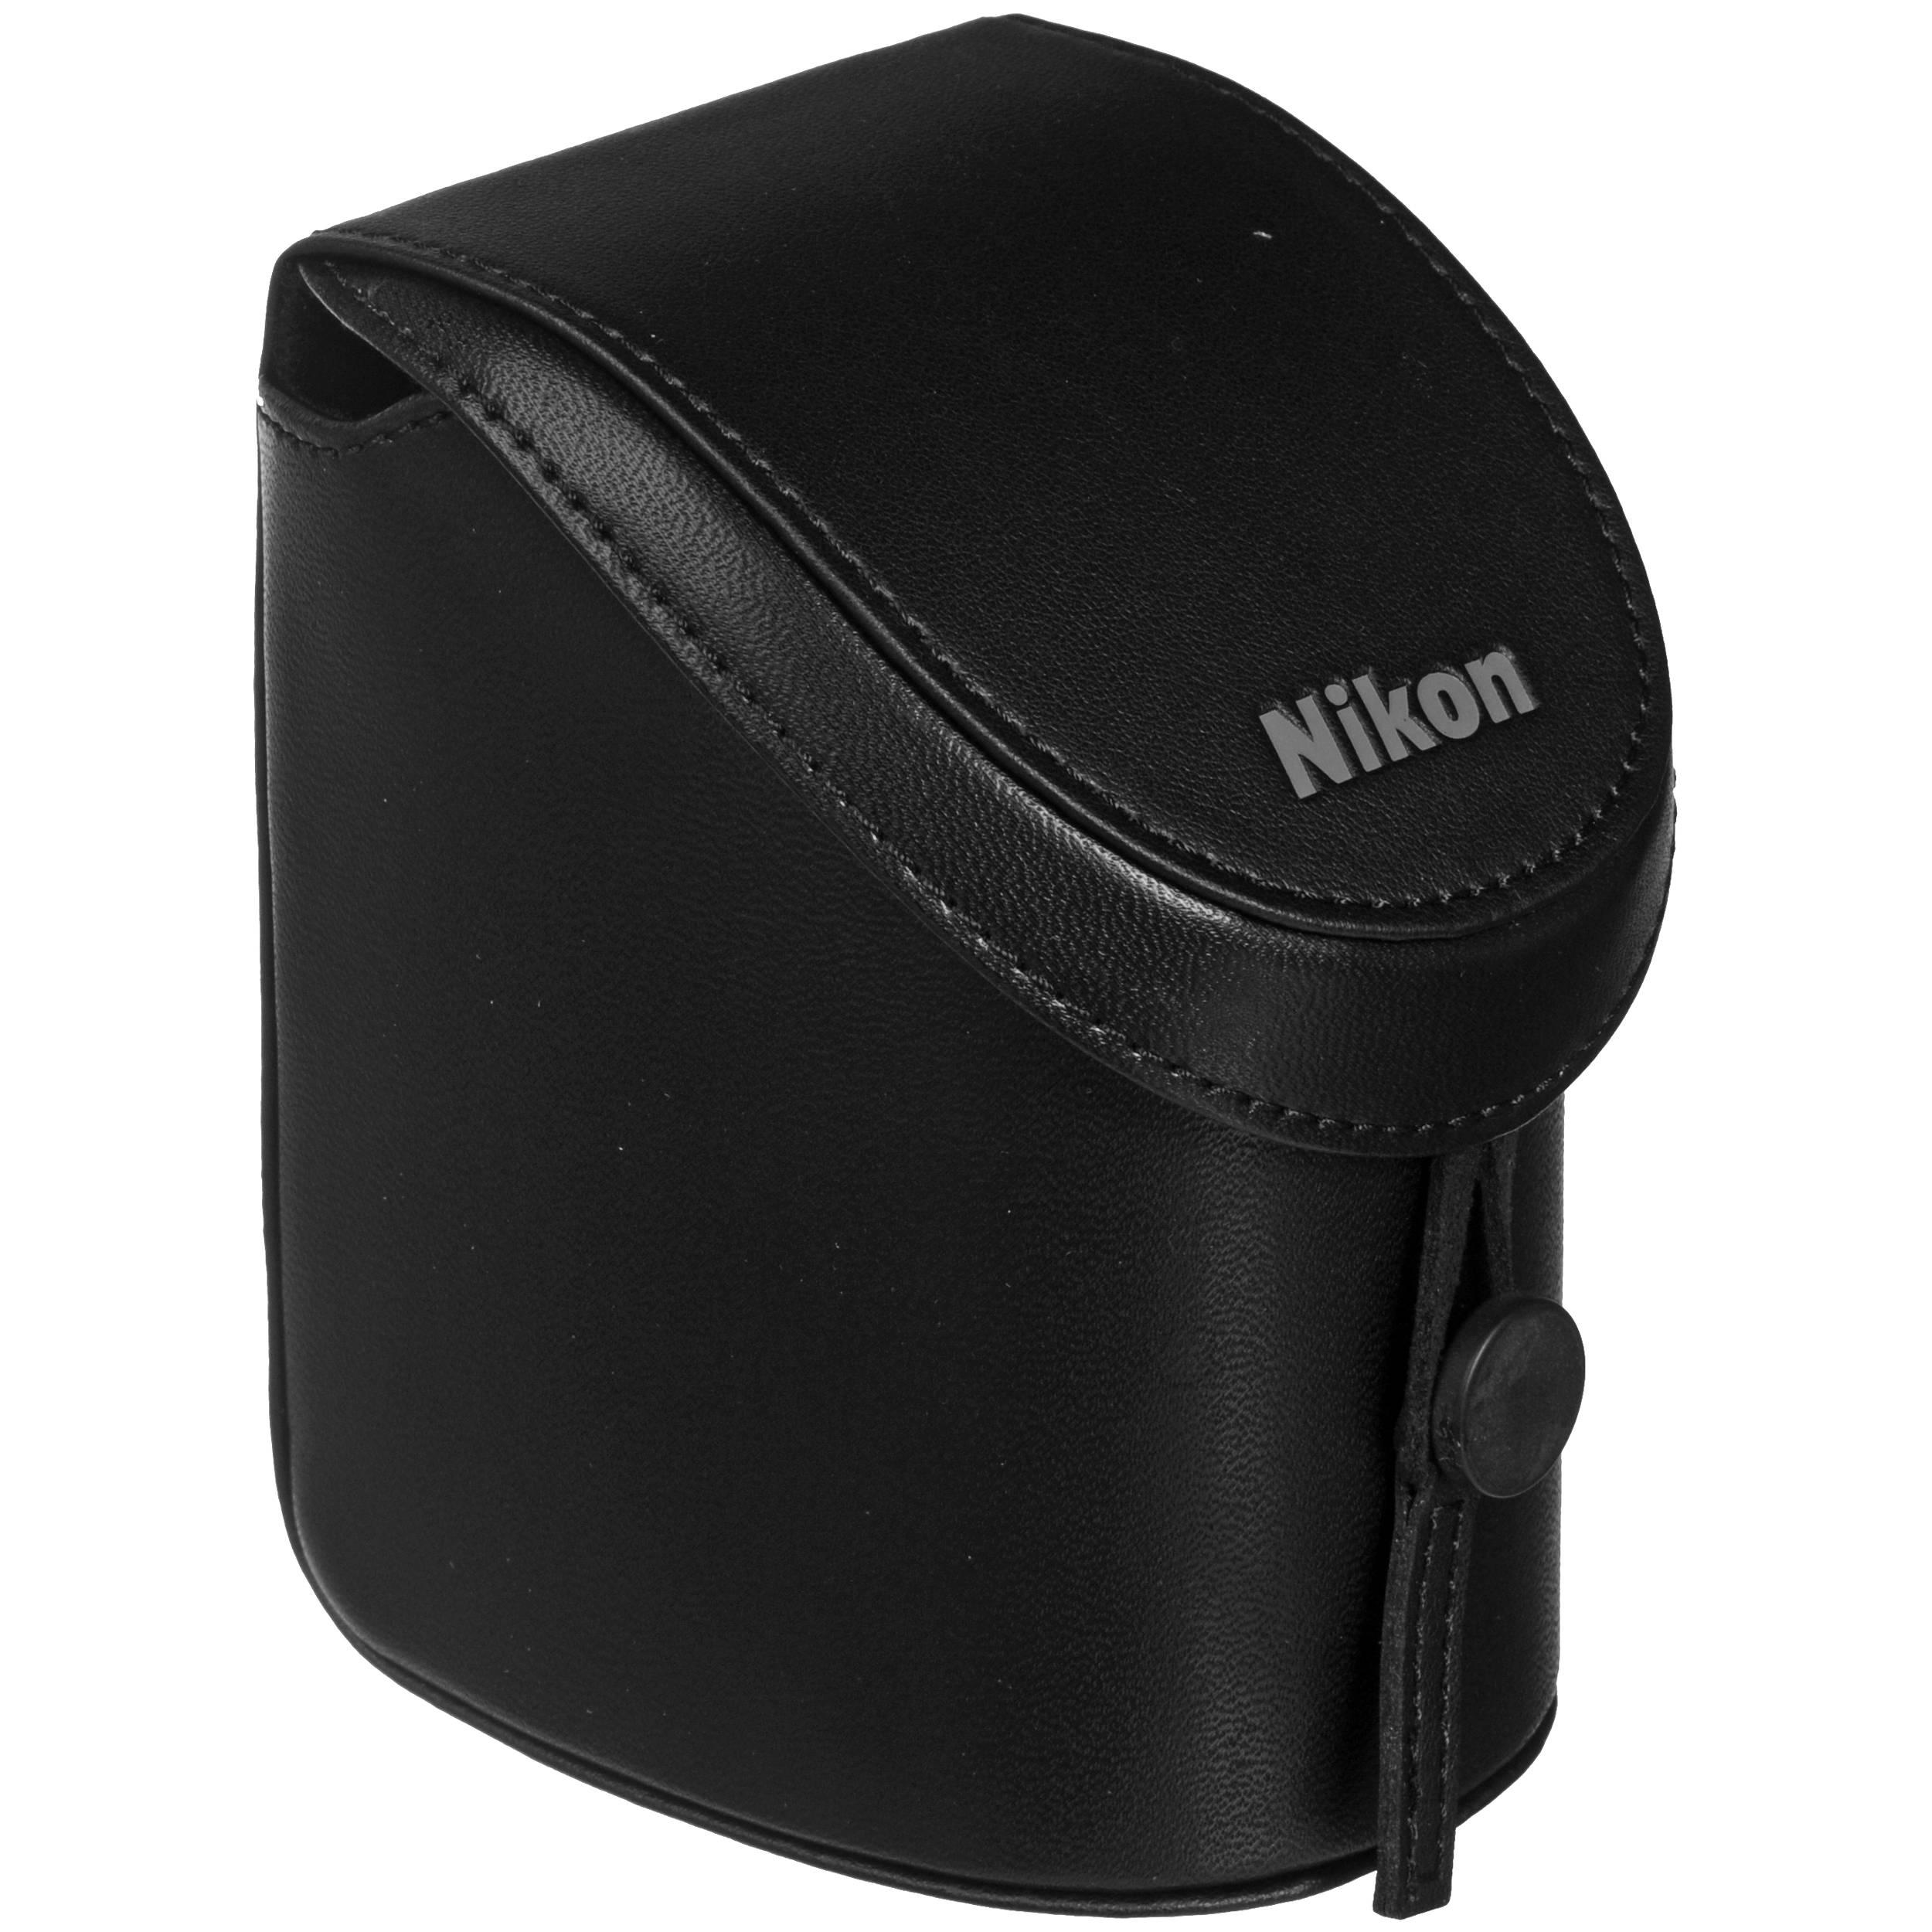 CF-N5000 Black custodia semi-soft Verticale per Nikon 1 S1, J2, J3 + 10-30mm